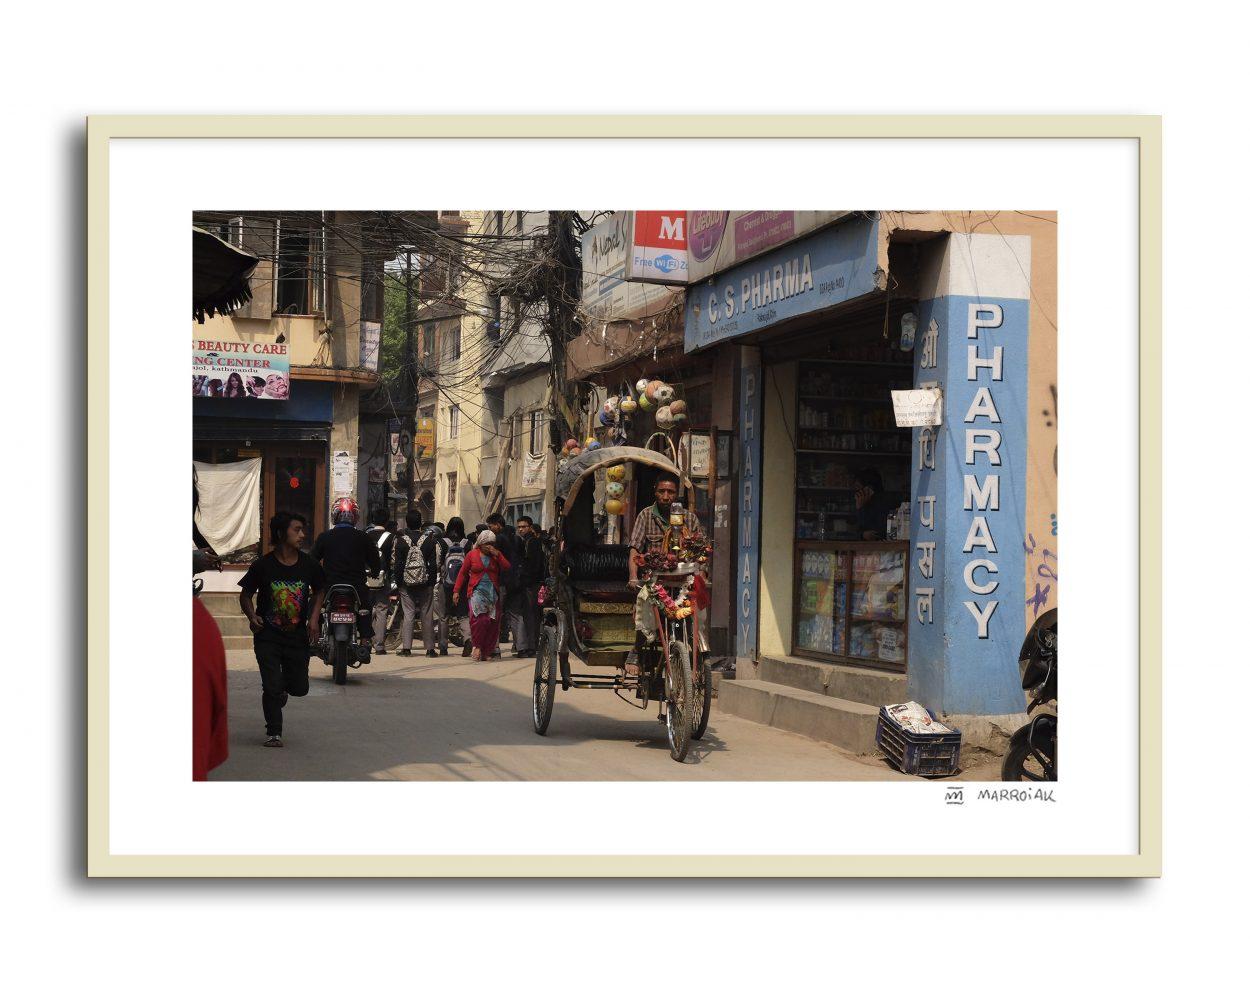 Fotografia de una calle de Kathmandu, Nepal